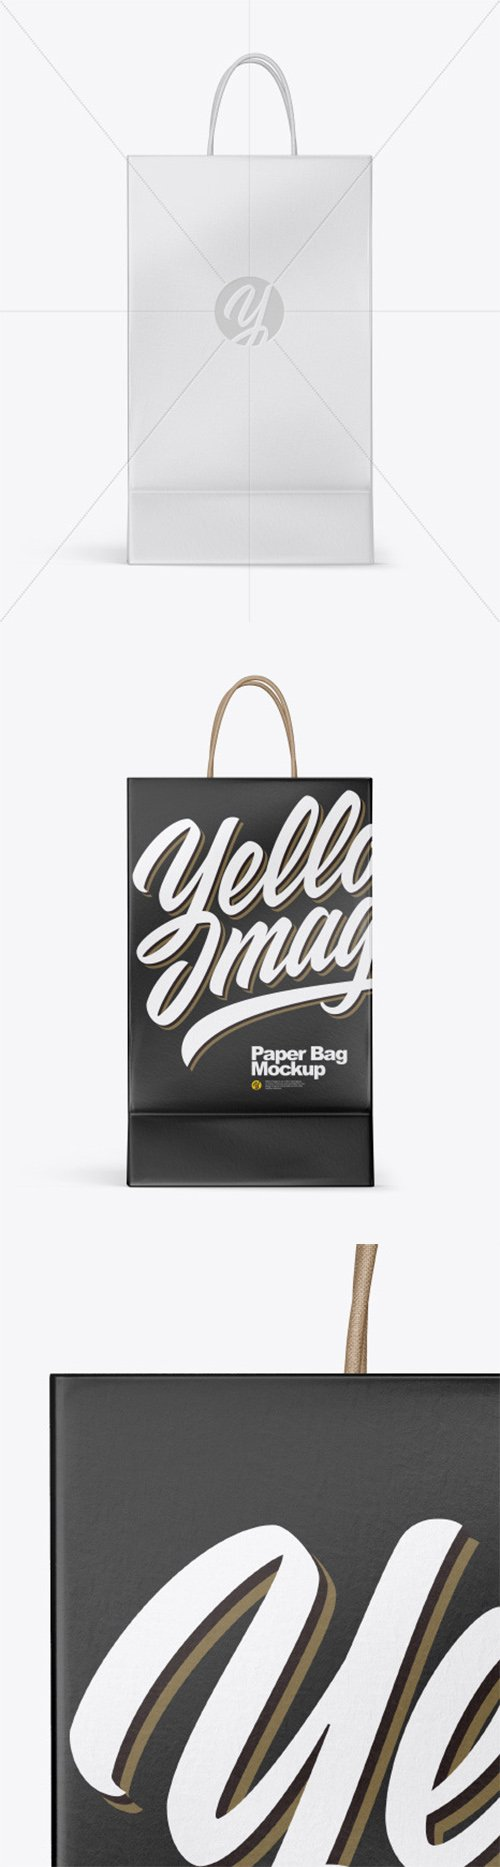 Textured Shopping Bag w/ Rope Handles Mockup 54420 TIF